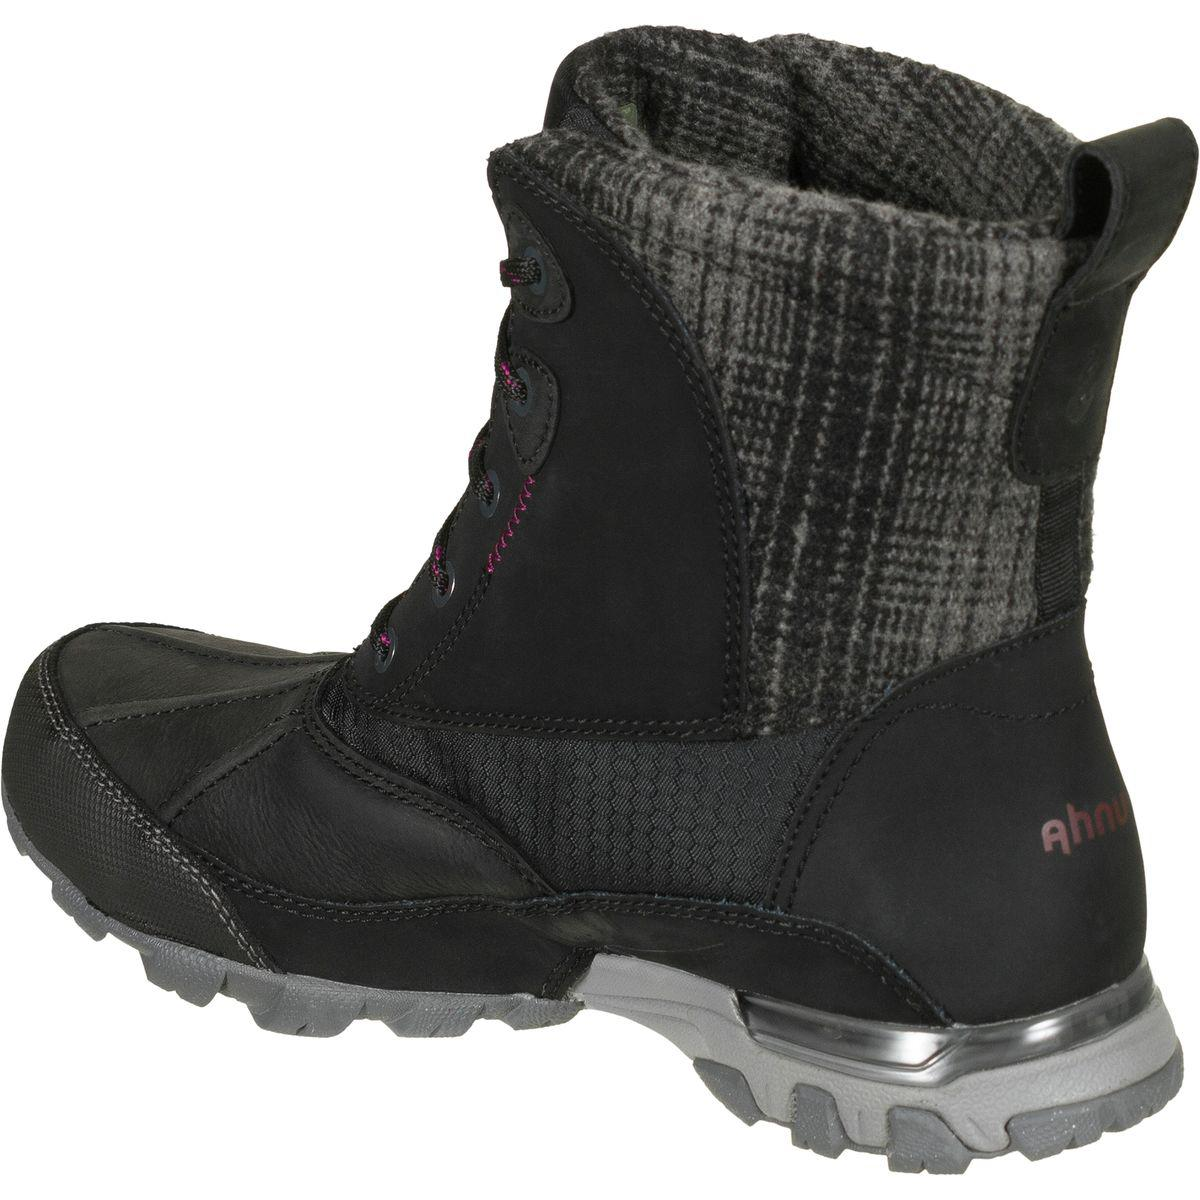 06aa3f25a25 Lyst - Ahnu Sugar Peak Insulated Wp Boot in Black for Men